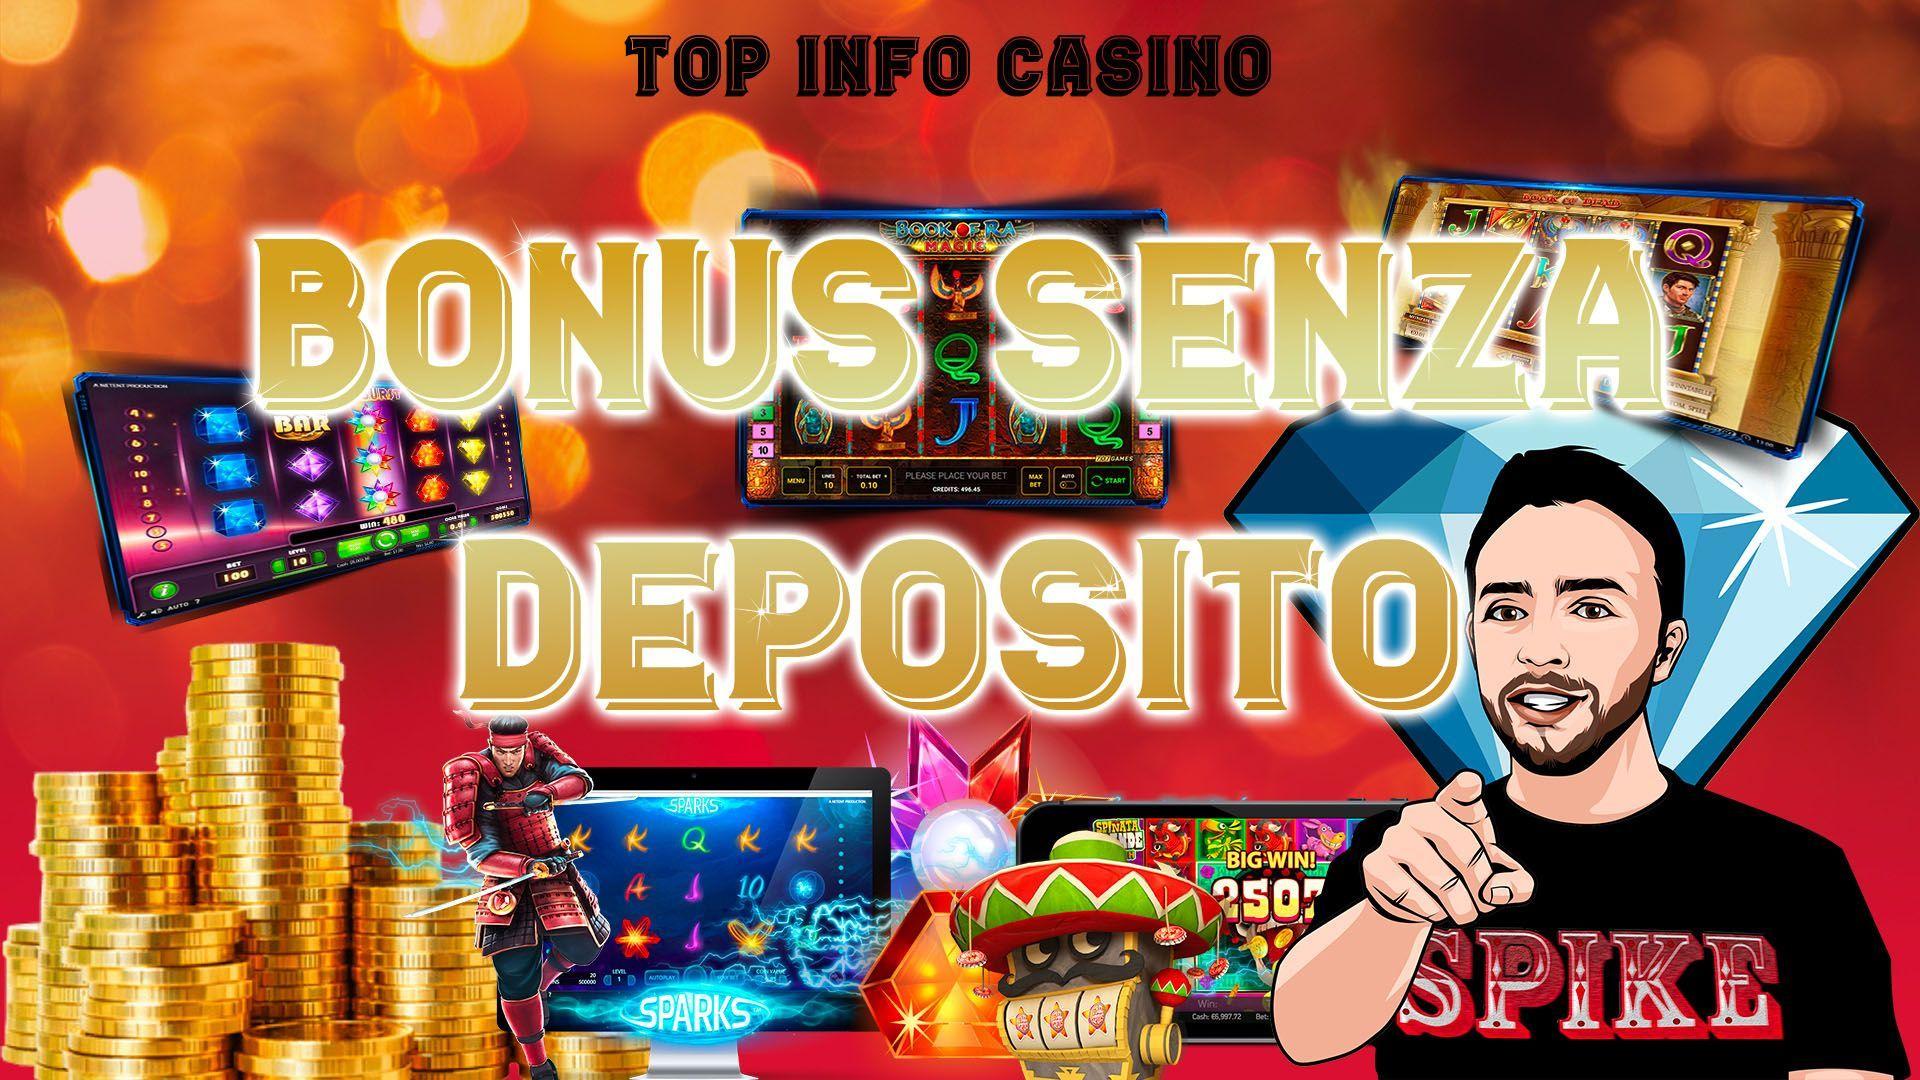 Logo Bonus Casino Senza Deposito Articolo